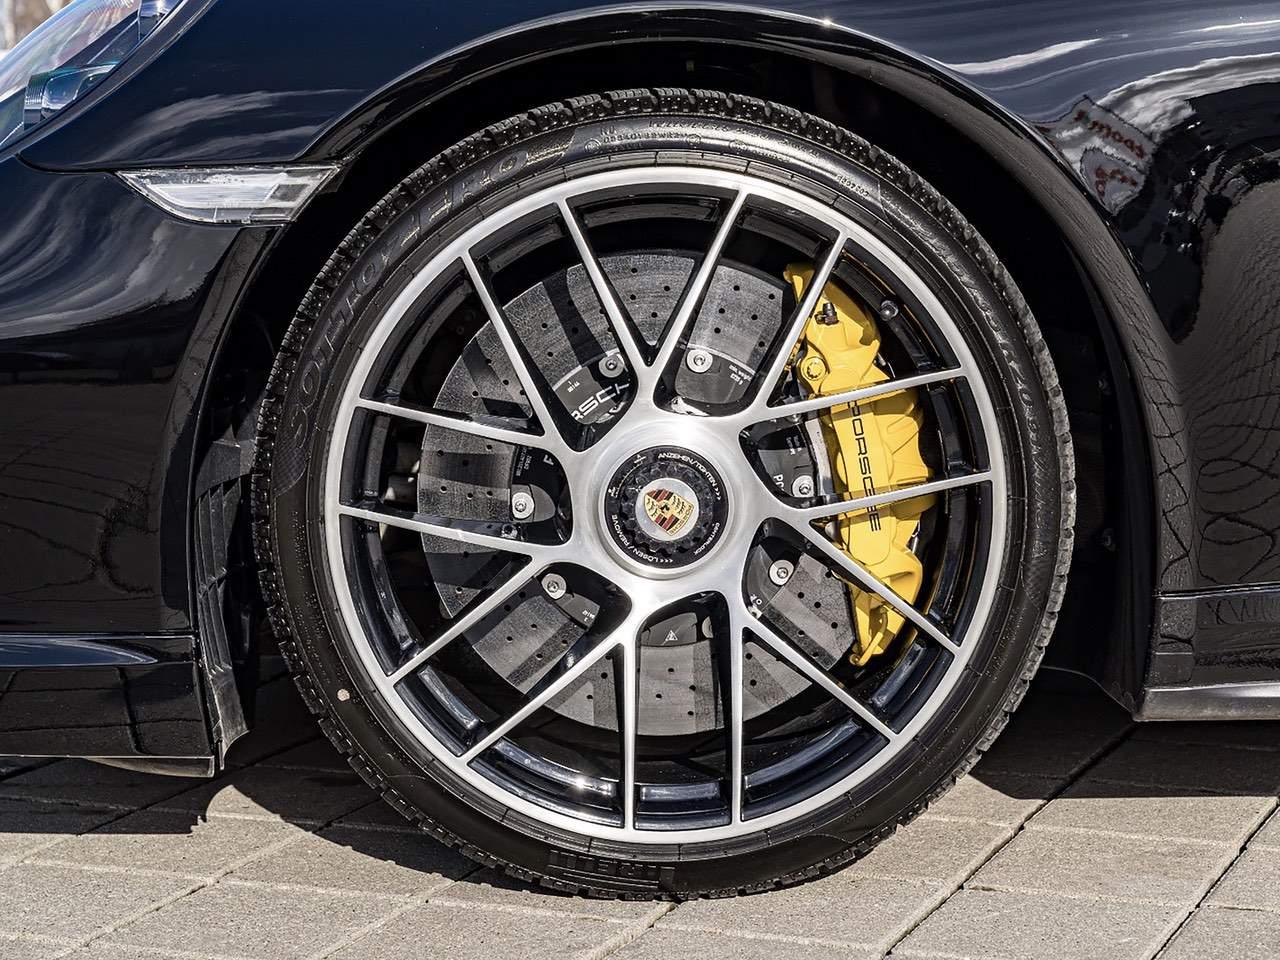 Porsche-911-Turbo-S-5